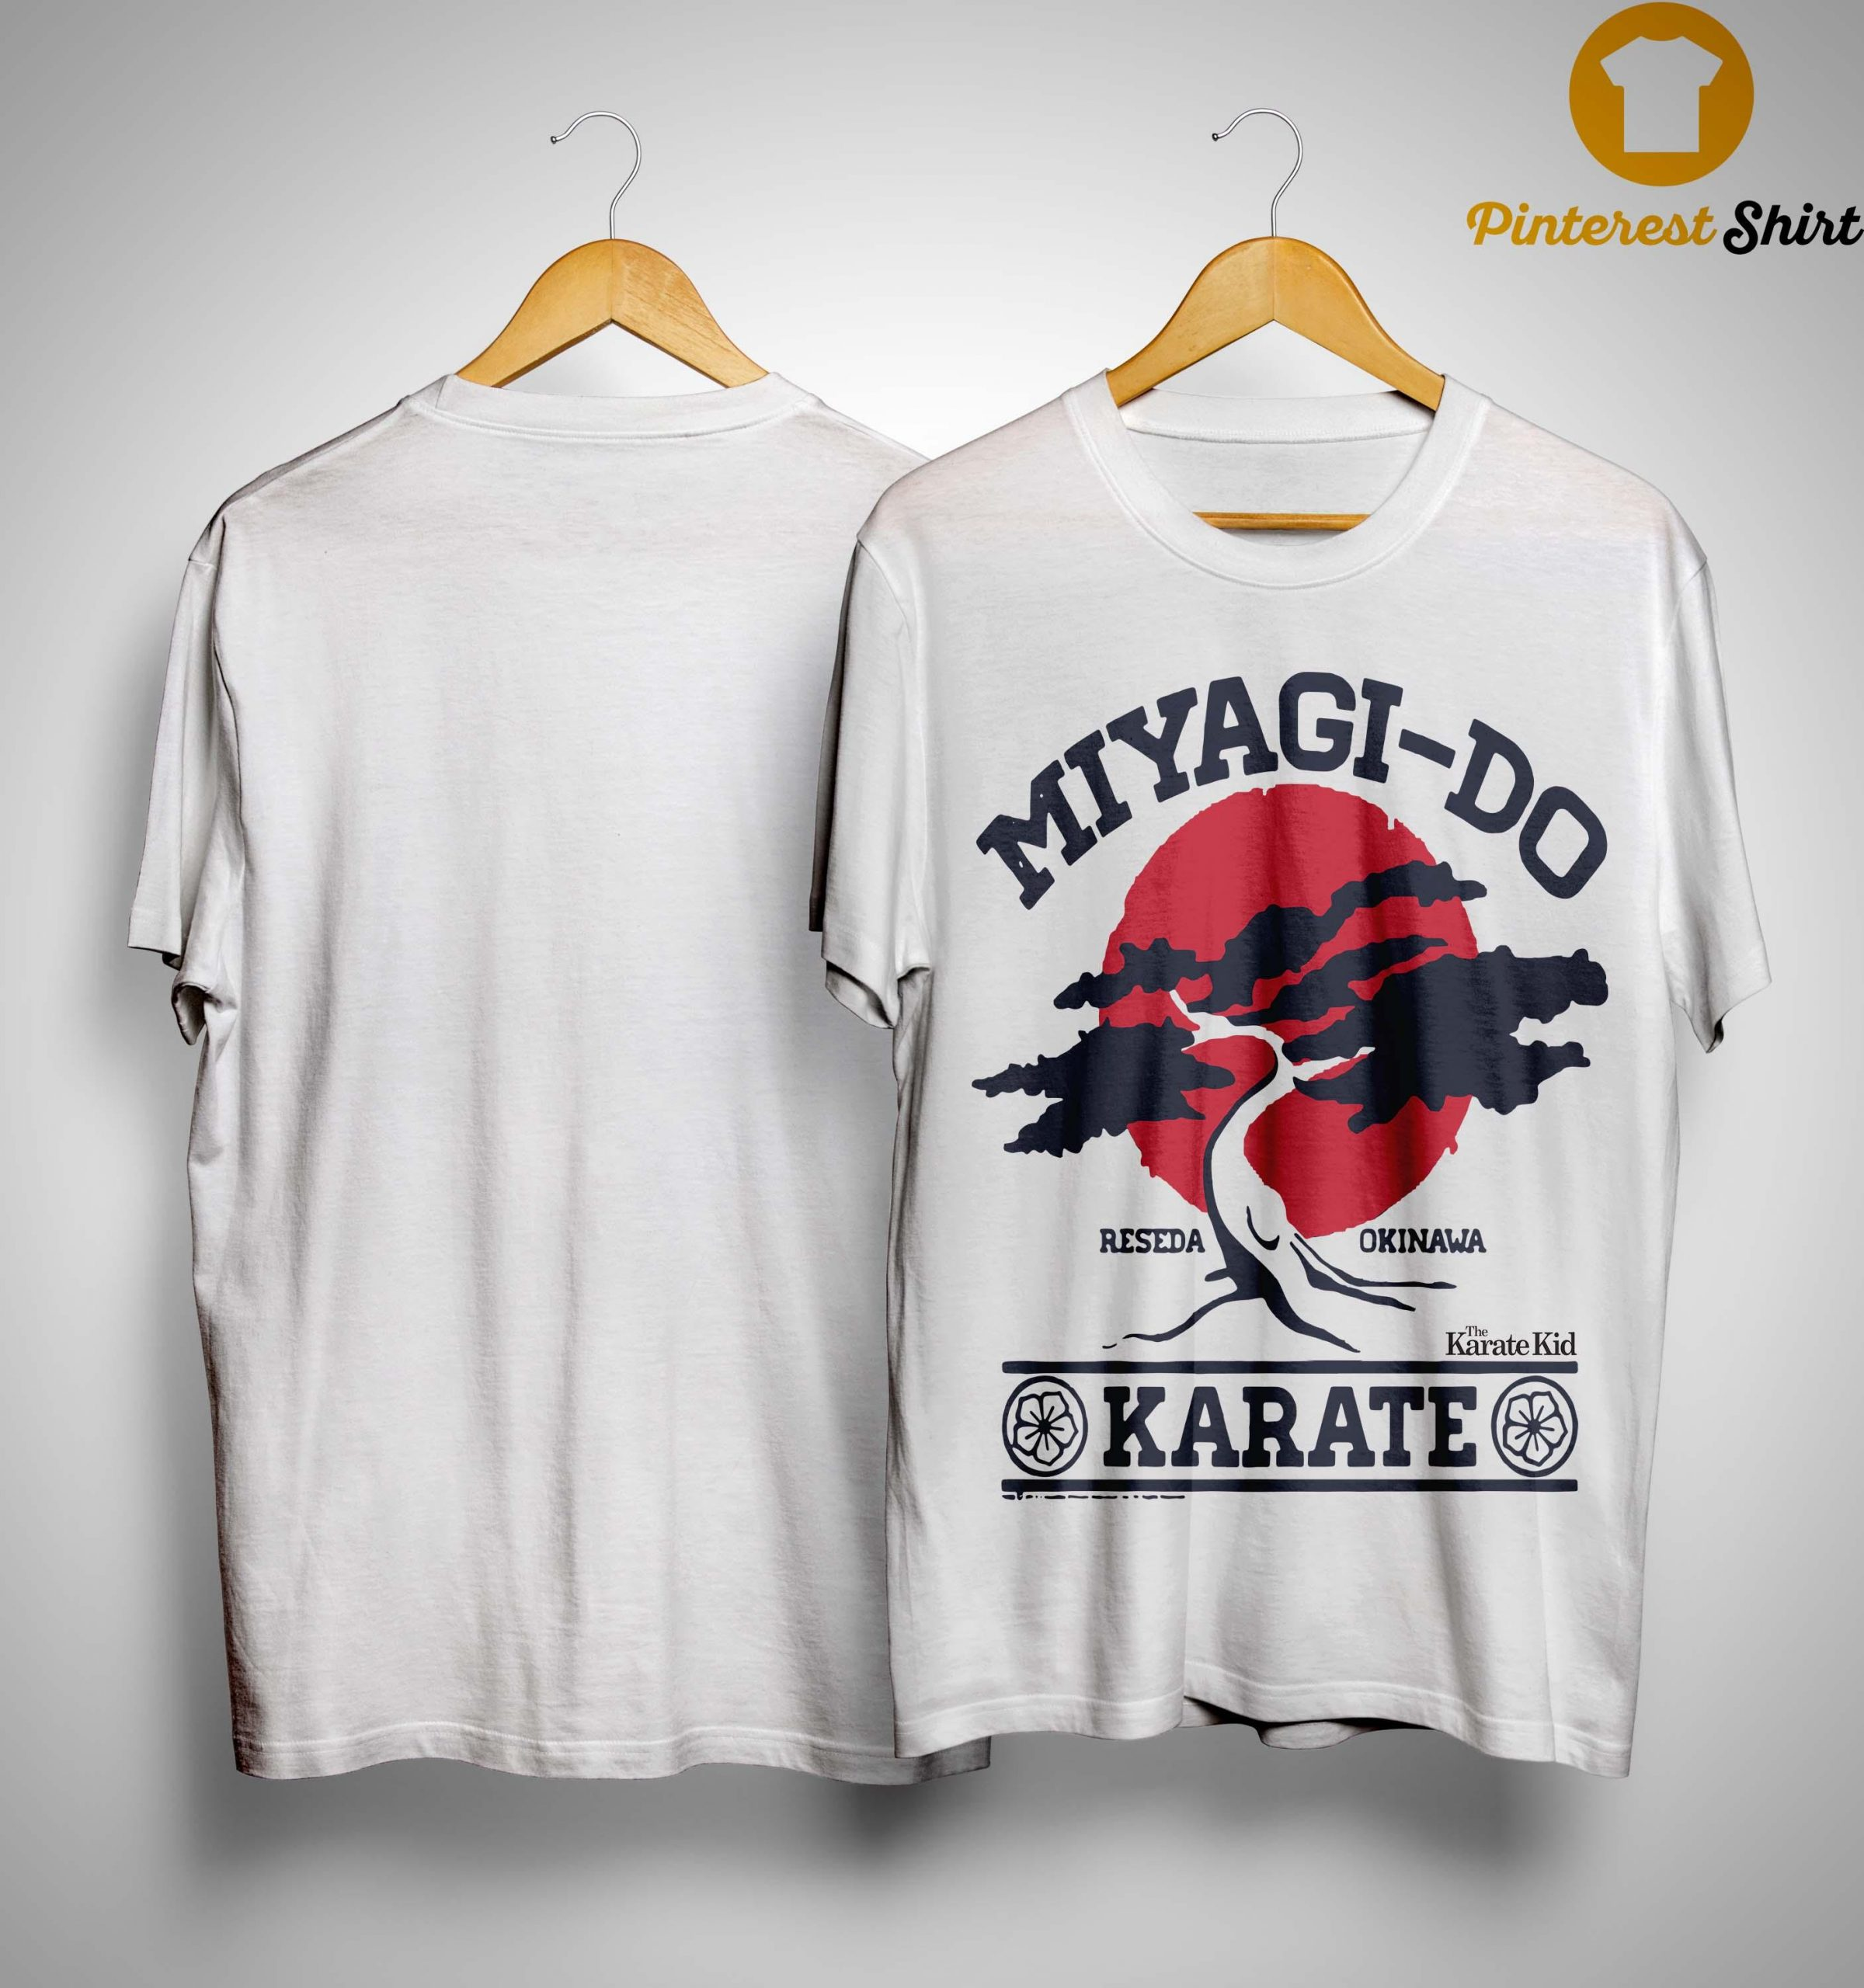 Miyagi Do Reseda Okinawa Karate Shirt